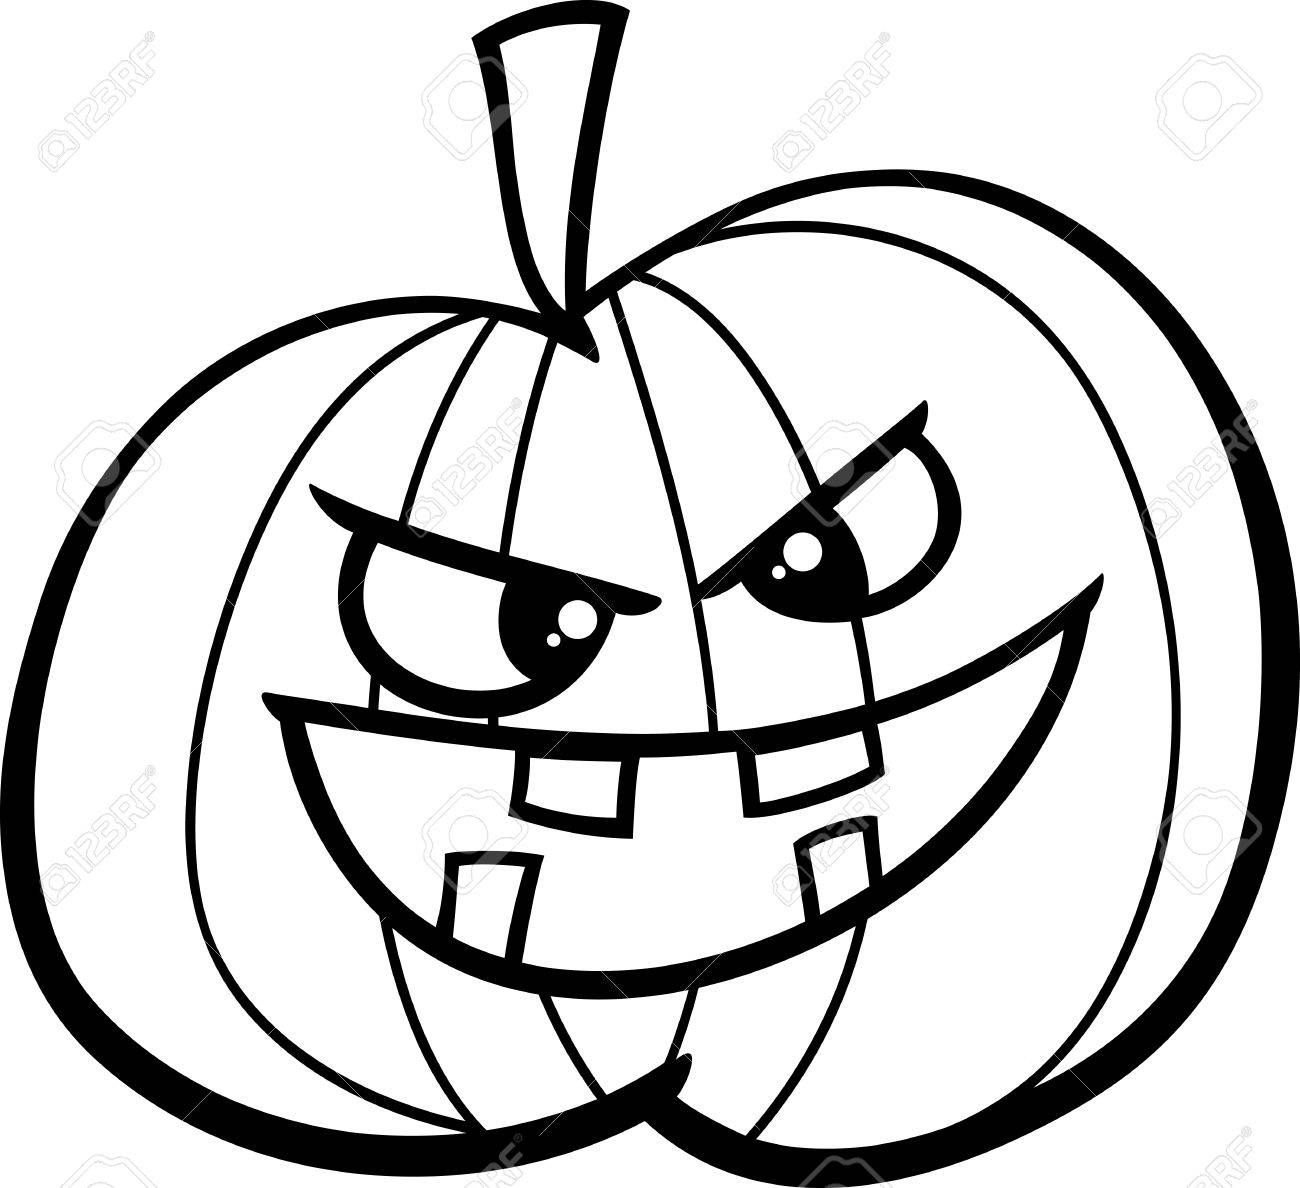 Black And White Cartoon Illustration Of Jack Lantern Halloween ...